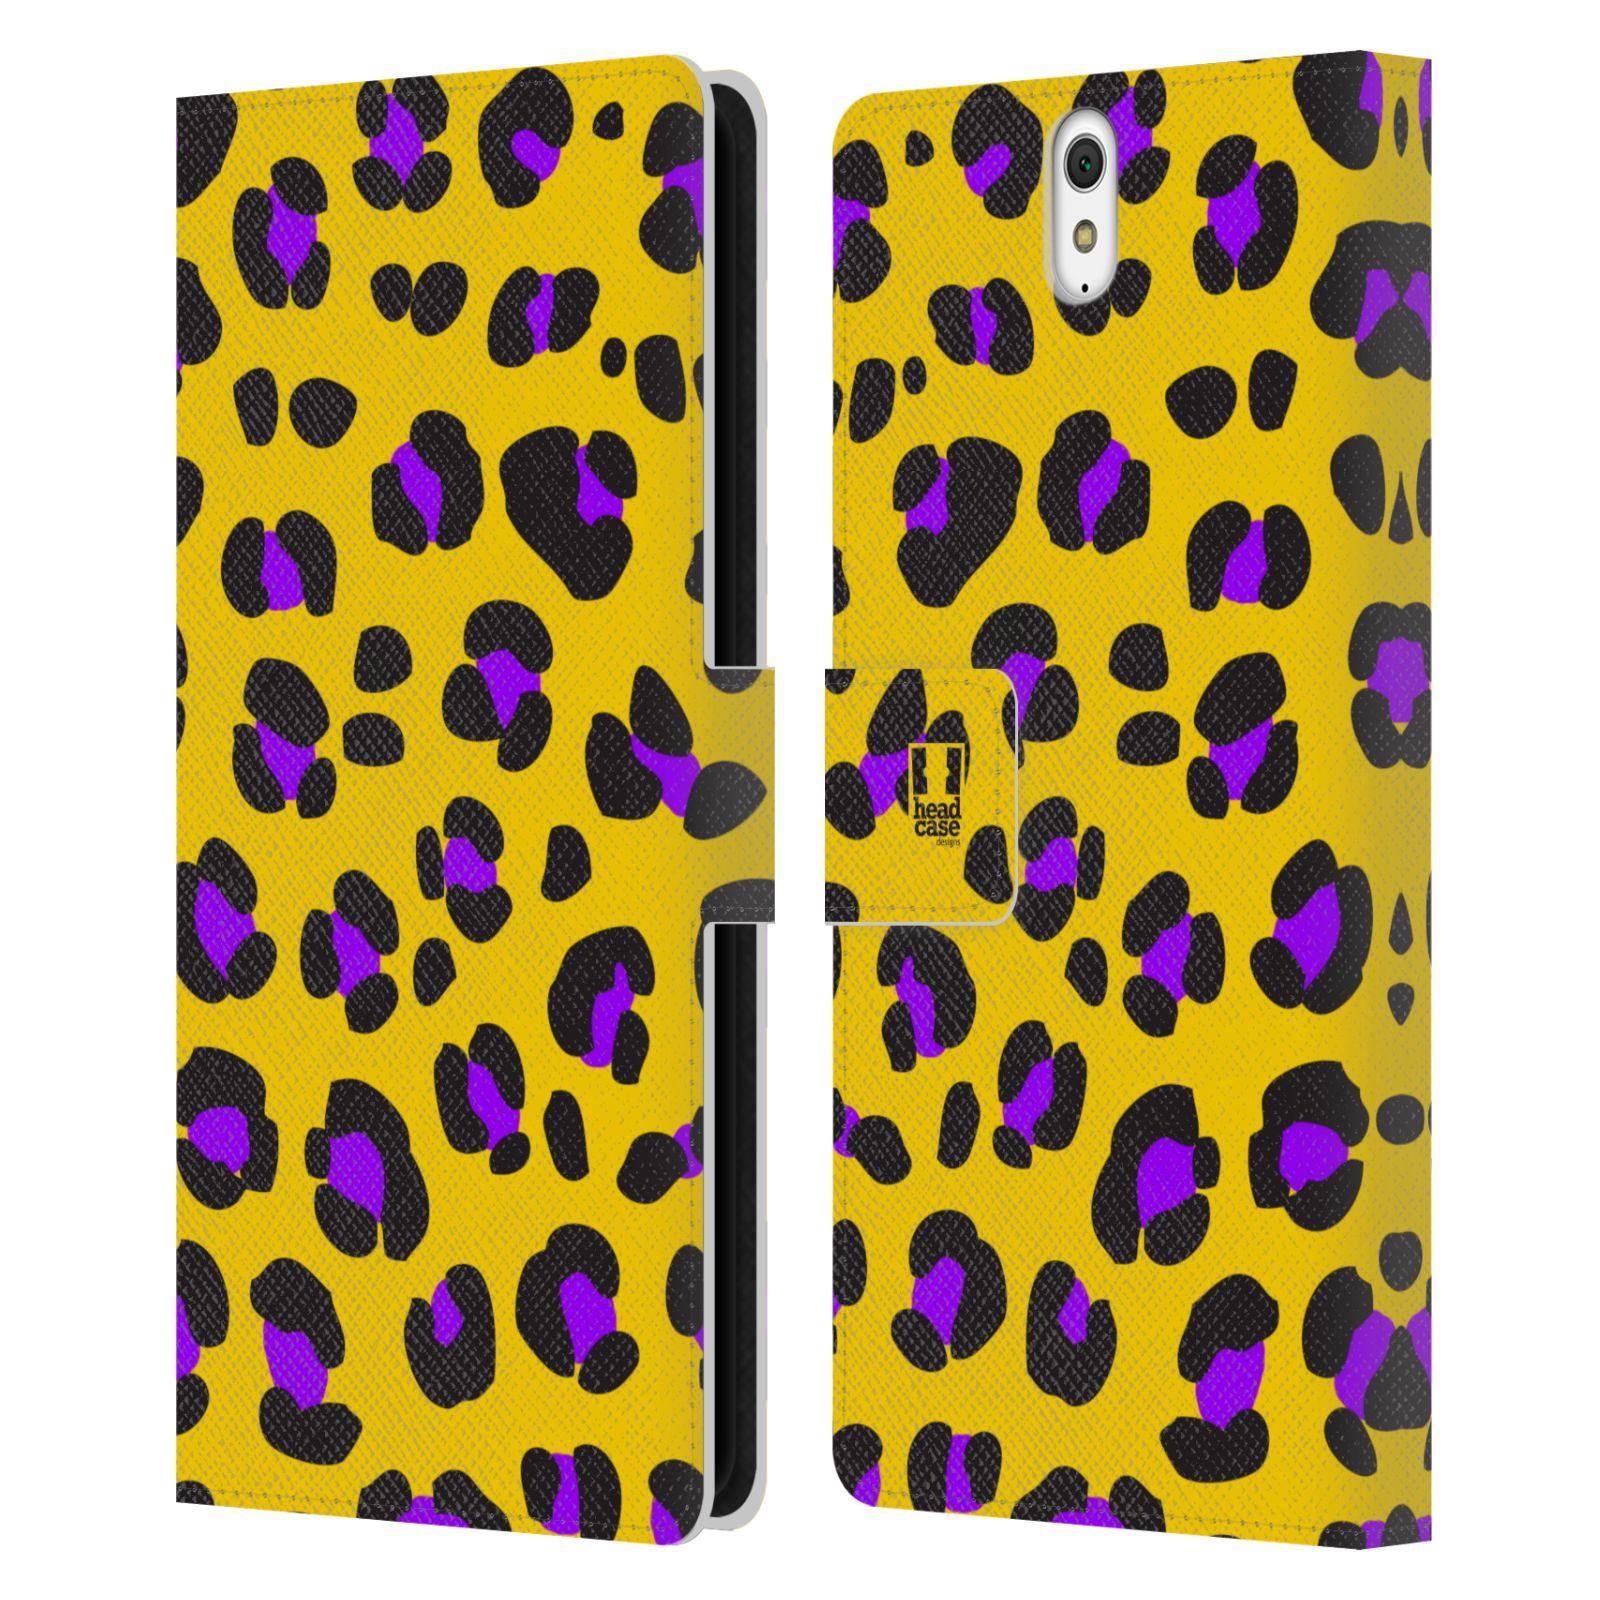 HEAD CASE Flipové pouzdro pro mobil SONY XPERIA C5 Ultra Zvířecí barevné vzory žlutý leopard fialové skvrny